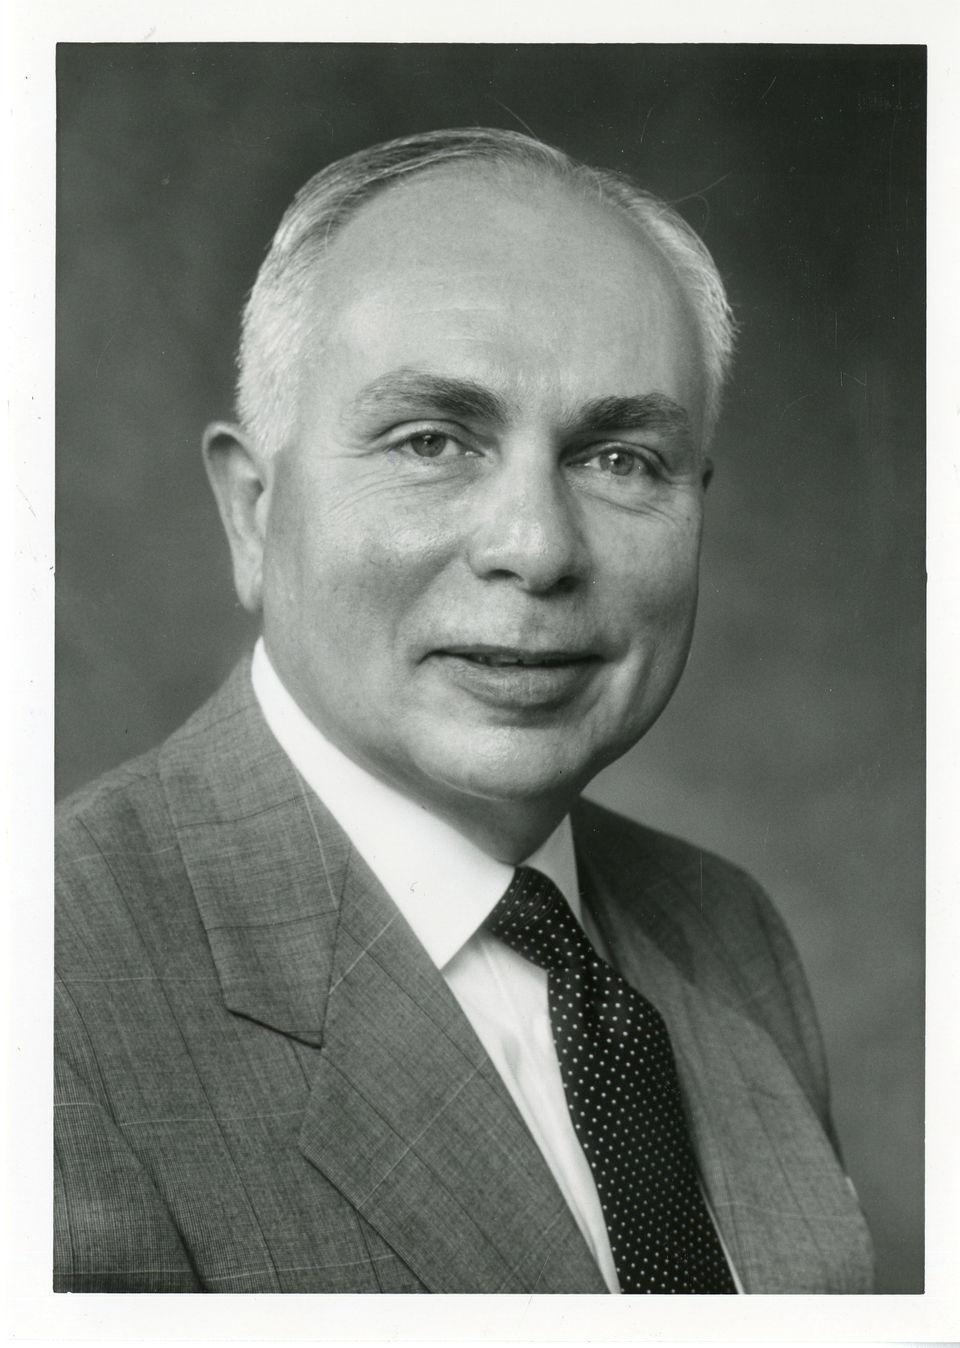 Ted Sande, photo copyright by Herbert Ascherman, Jr.